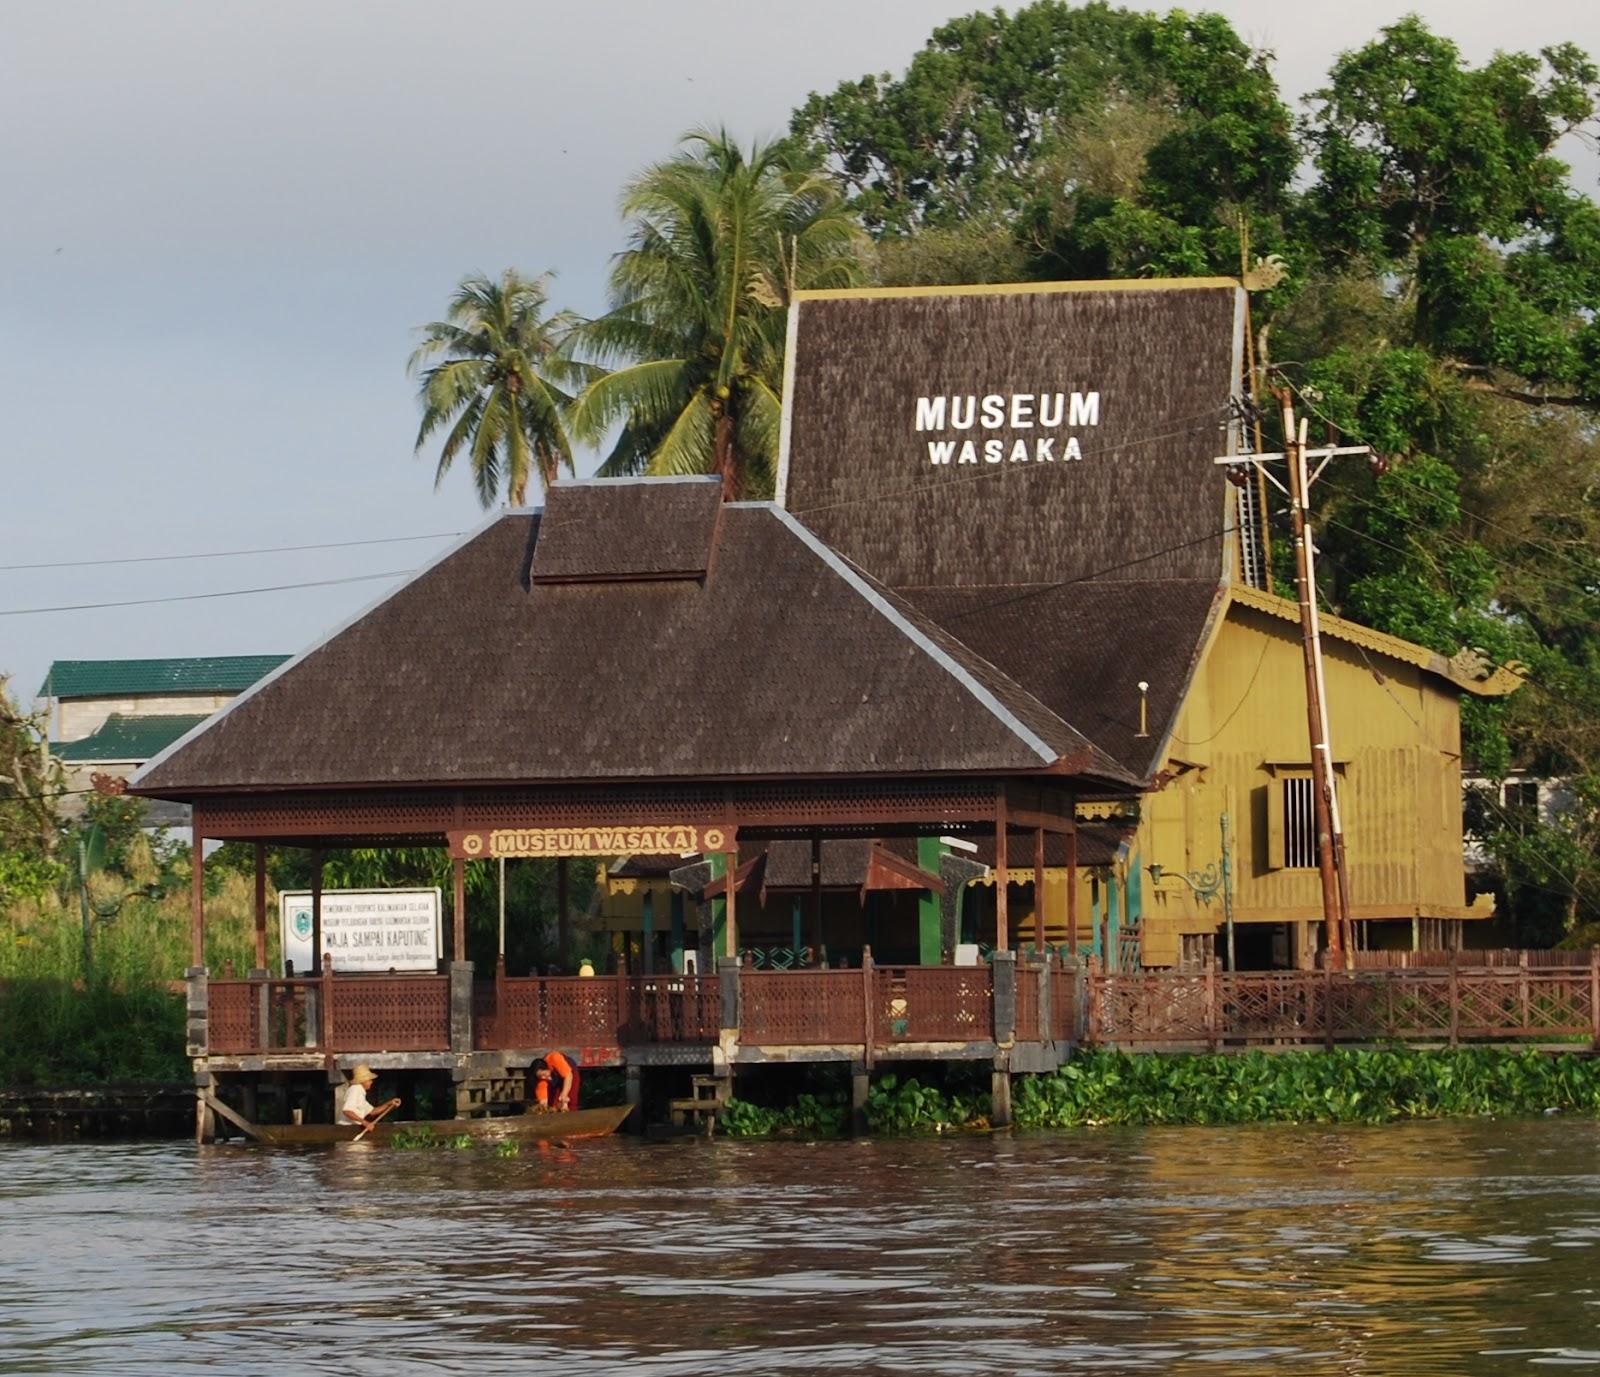 Museum Wasaka Menyimpan Kisah Perjuangan Rakyat Kalimantan Selatan Kab Banjarmasin